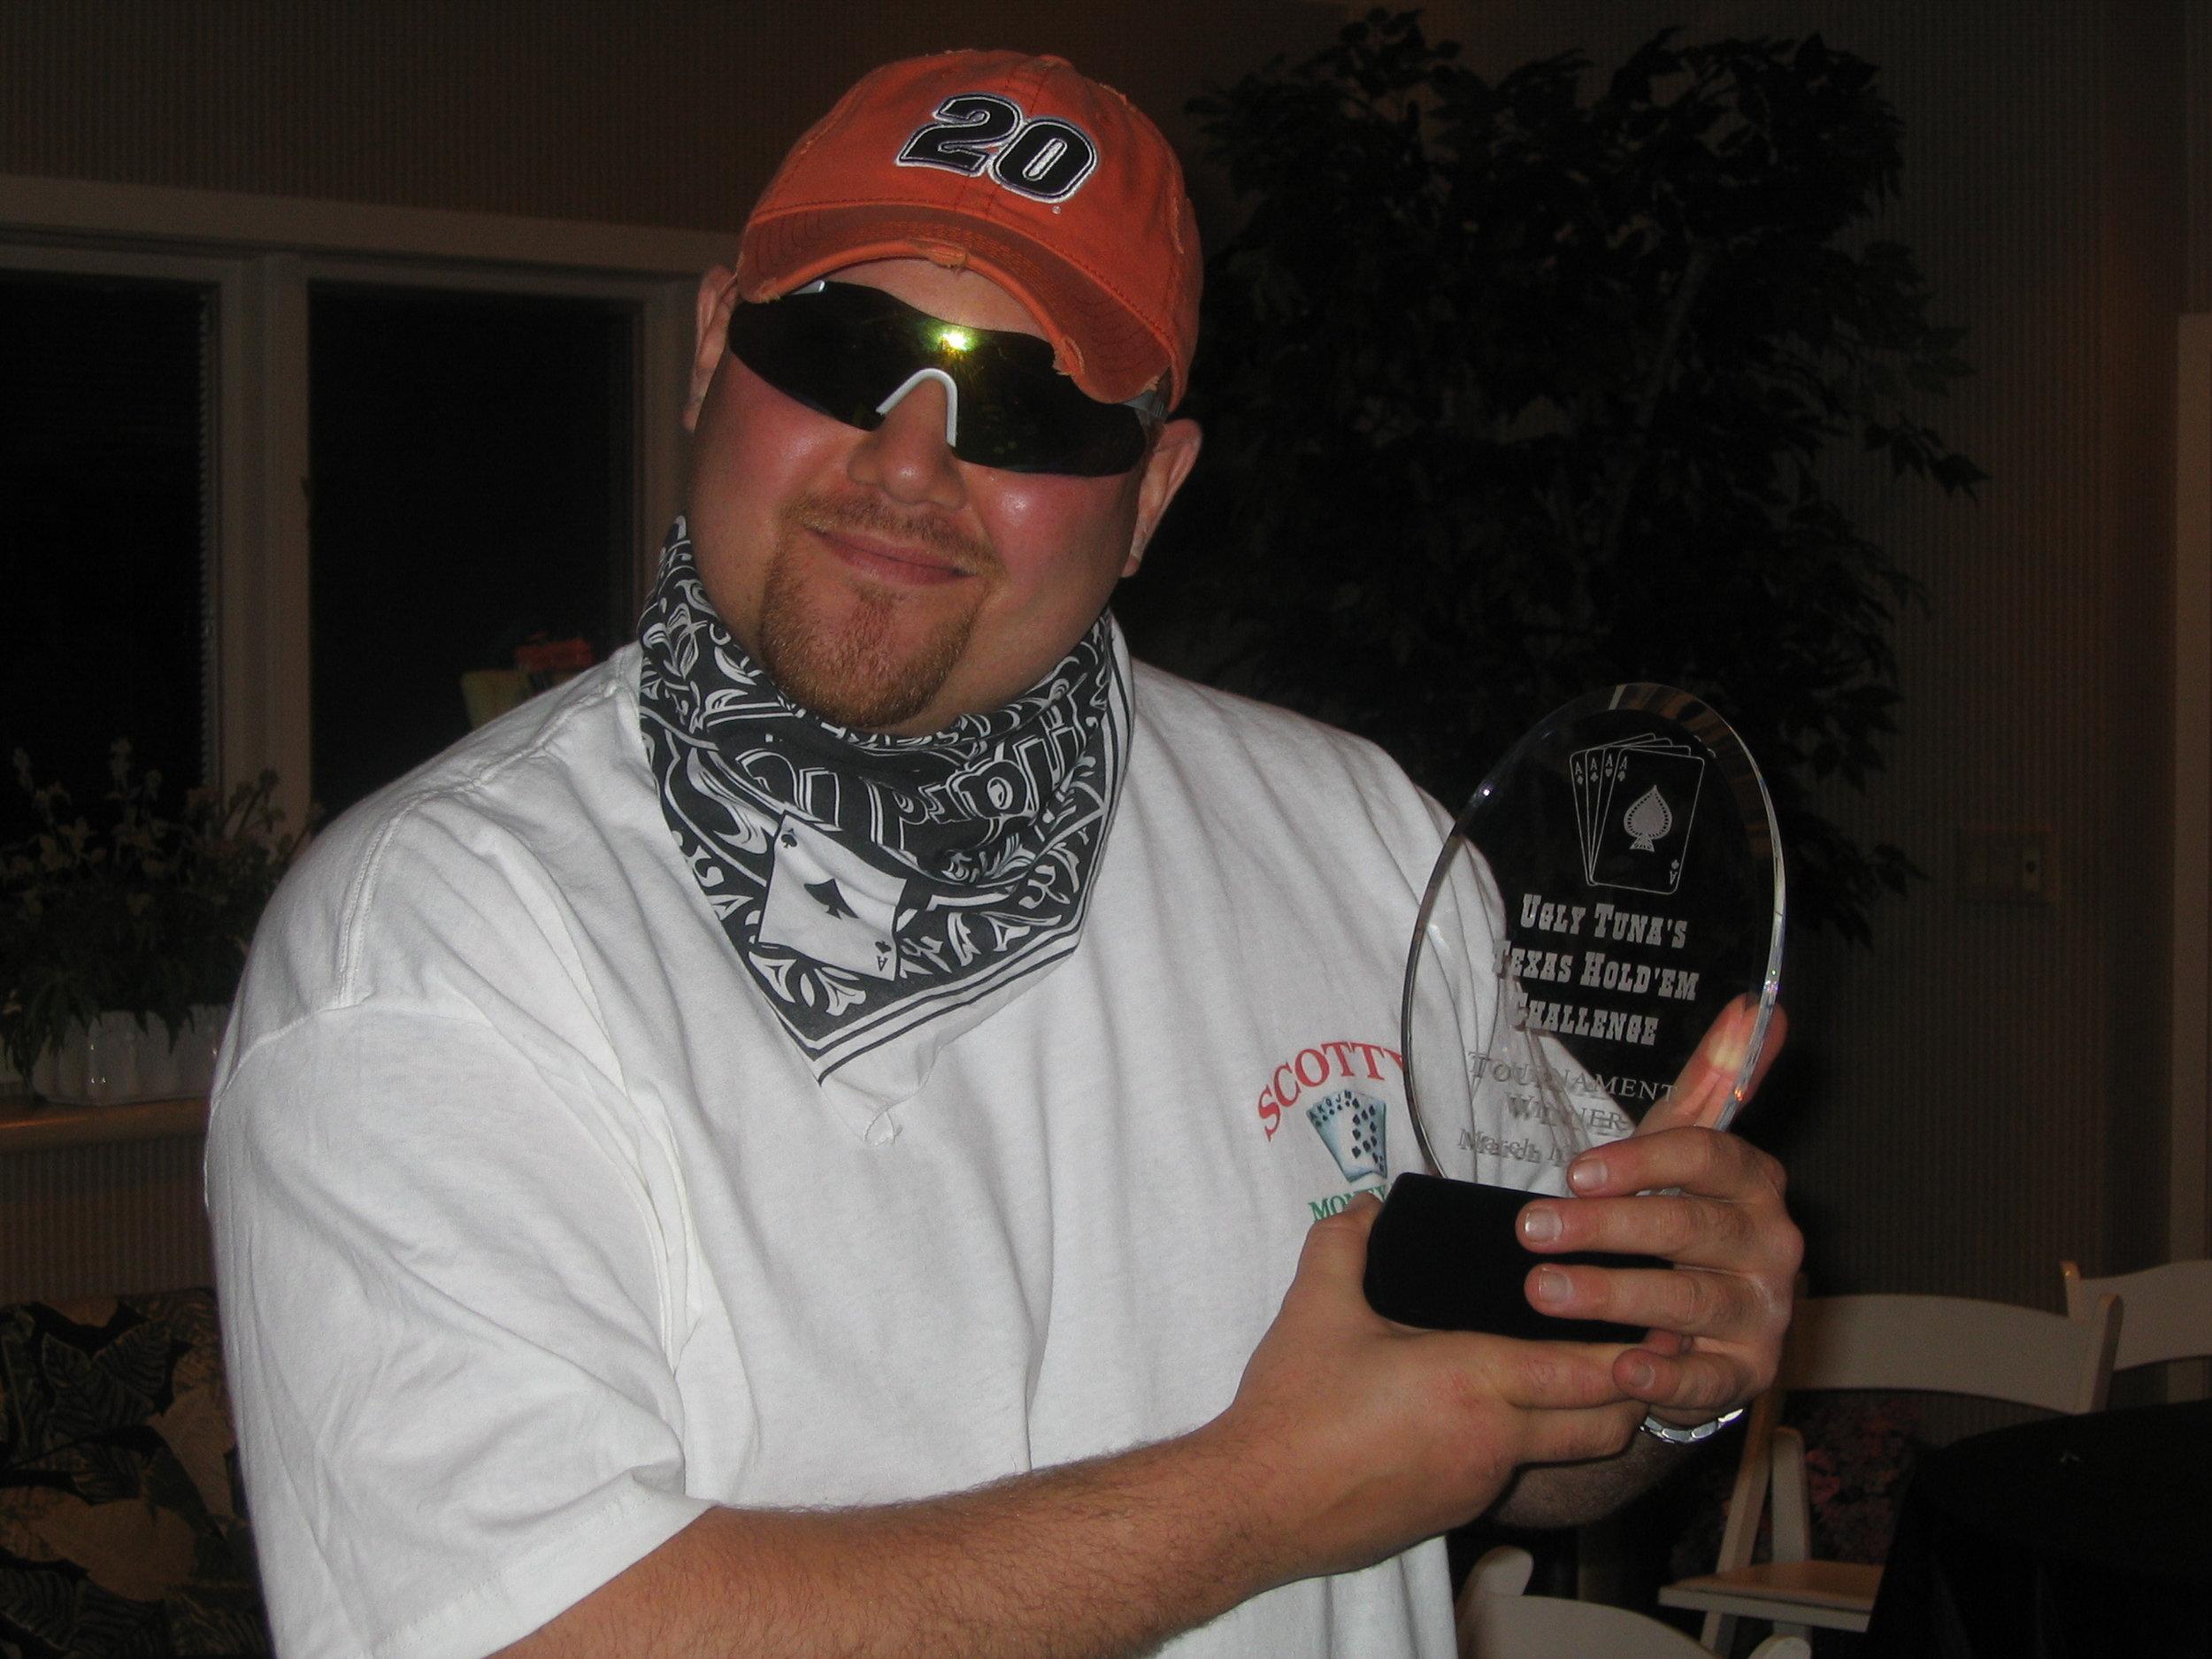 03-13-04 - 2nd Texas Hold'em Challenge 024.jpg